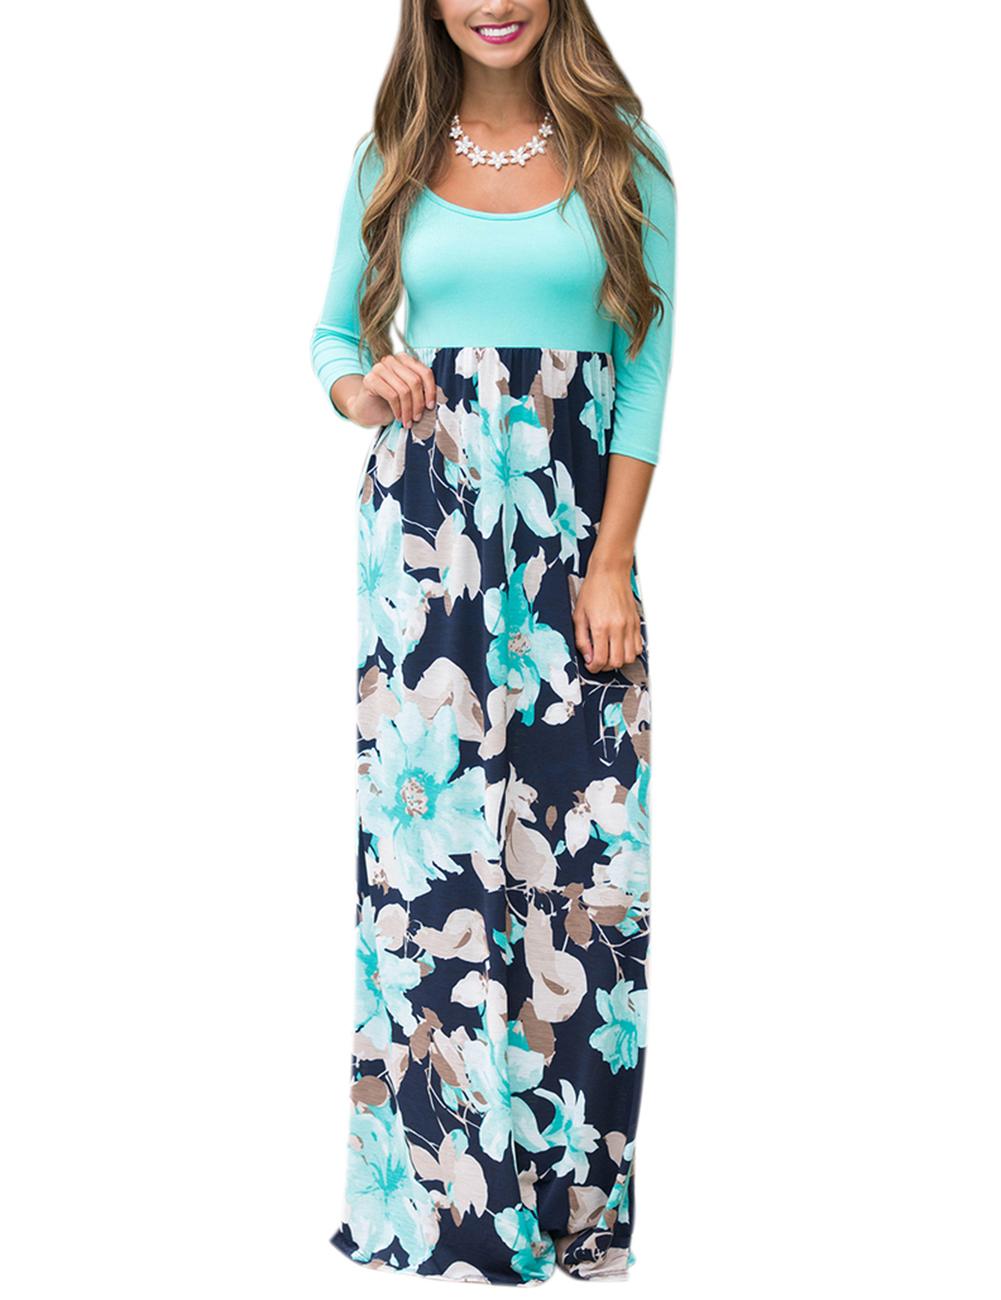 GloryStar Women 3/4 Sleeve Scoop Neck Spliced Floral Boho Maxi Holiday Dress S